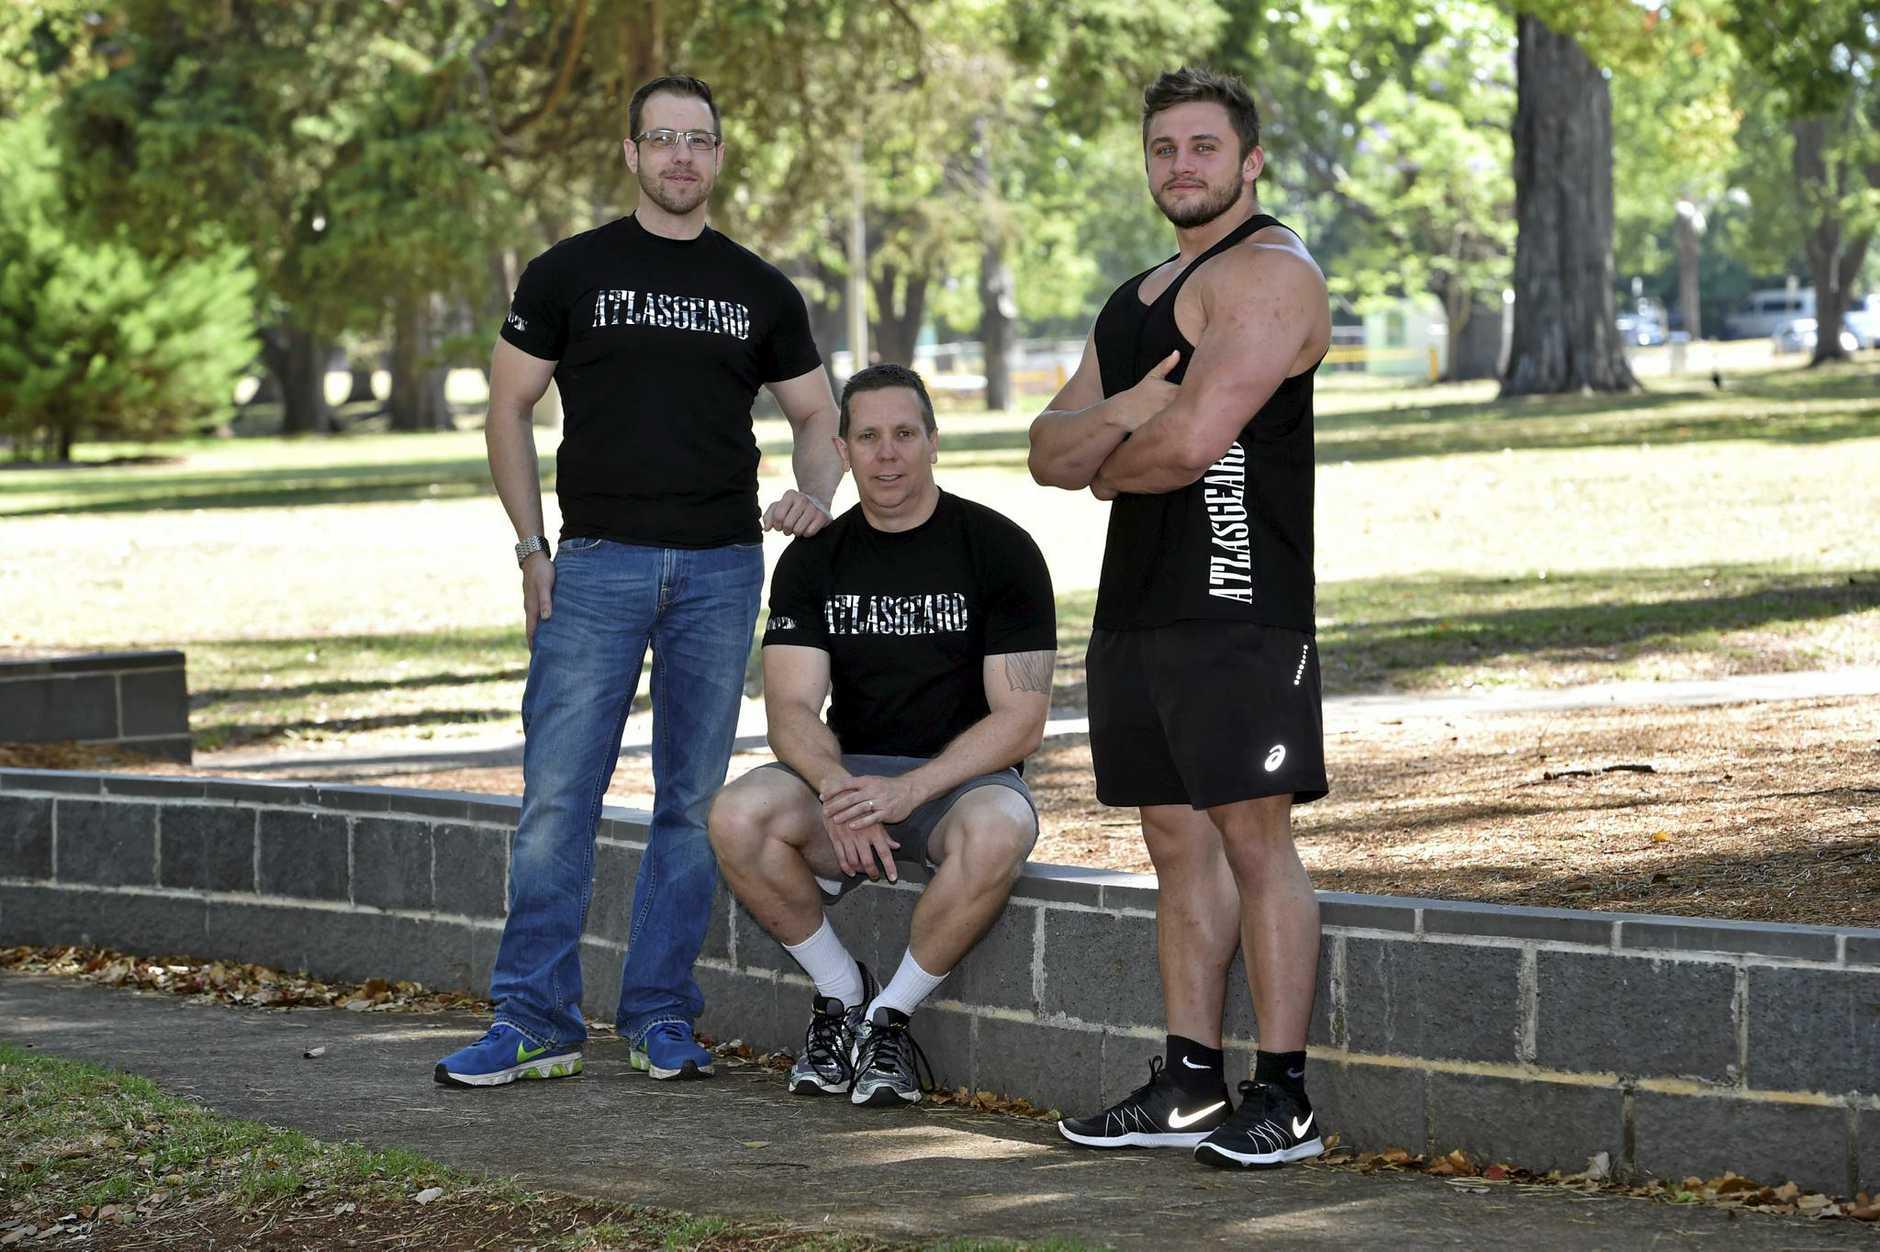 New fashion leisure wear range designed in Toowoomba, Atlasgeard is owner Barry Janetzki (left) and models, Michael Vels and Jordan McIntrye. December 2016.